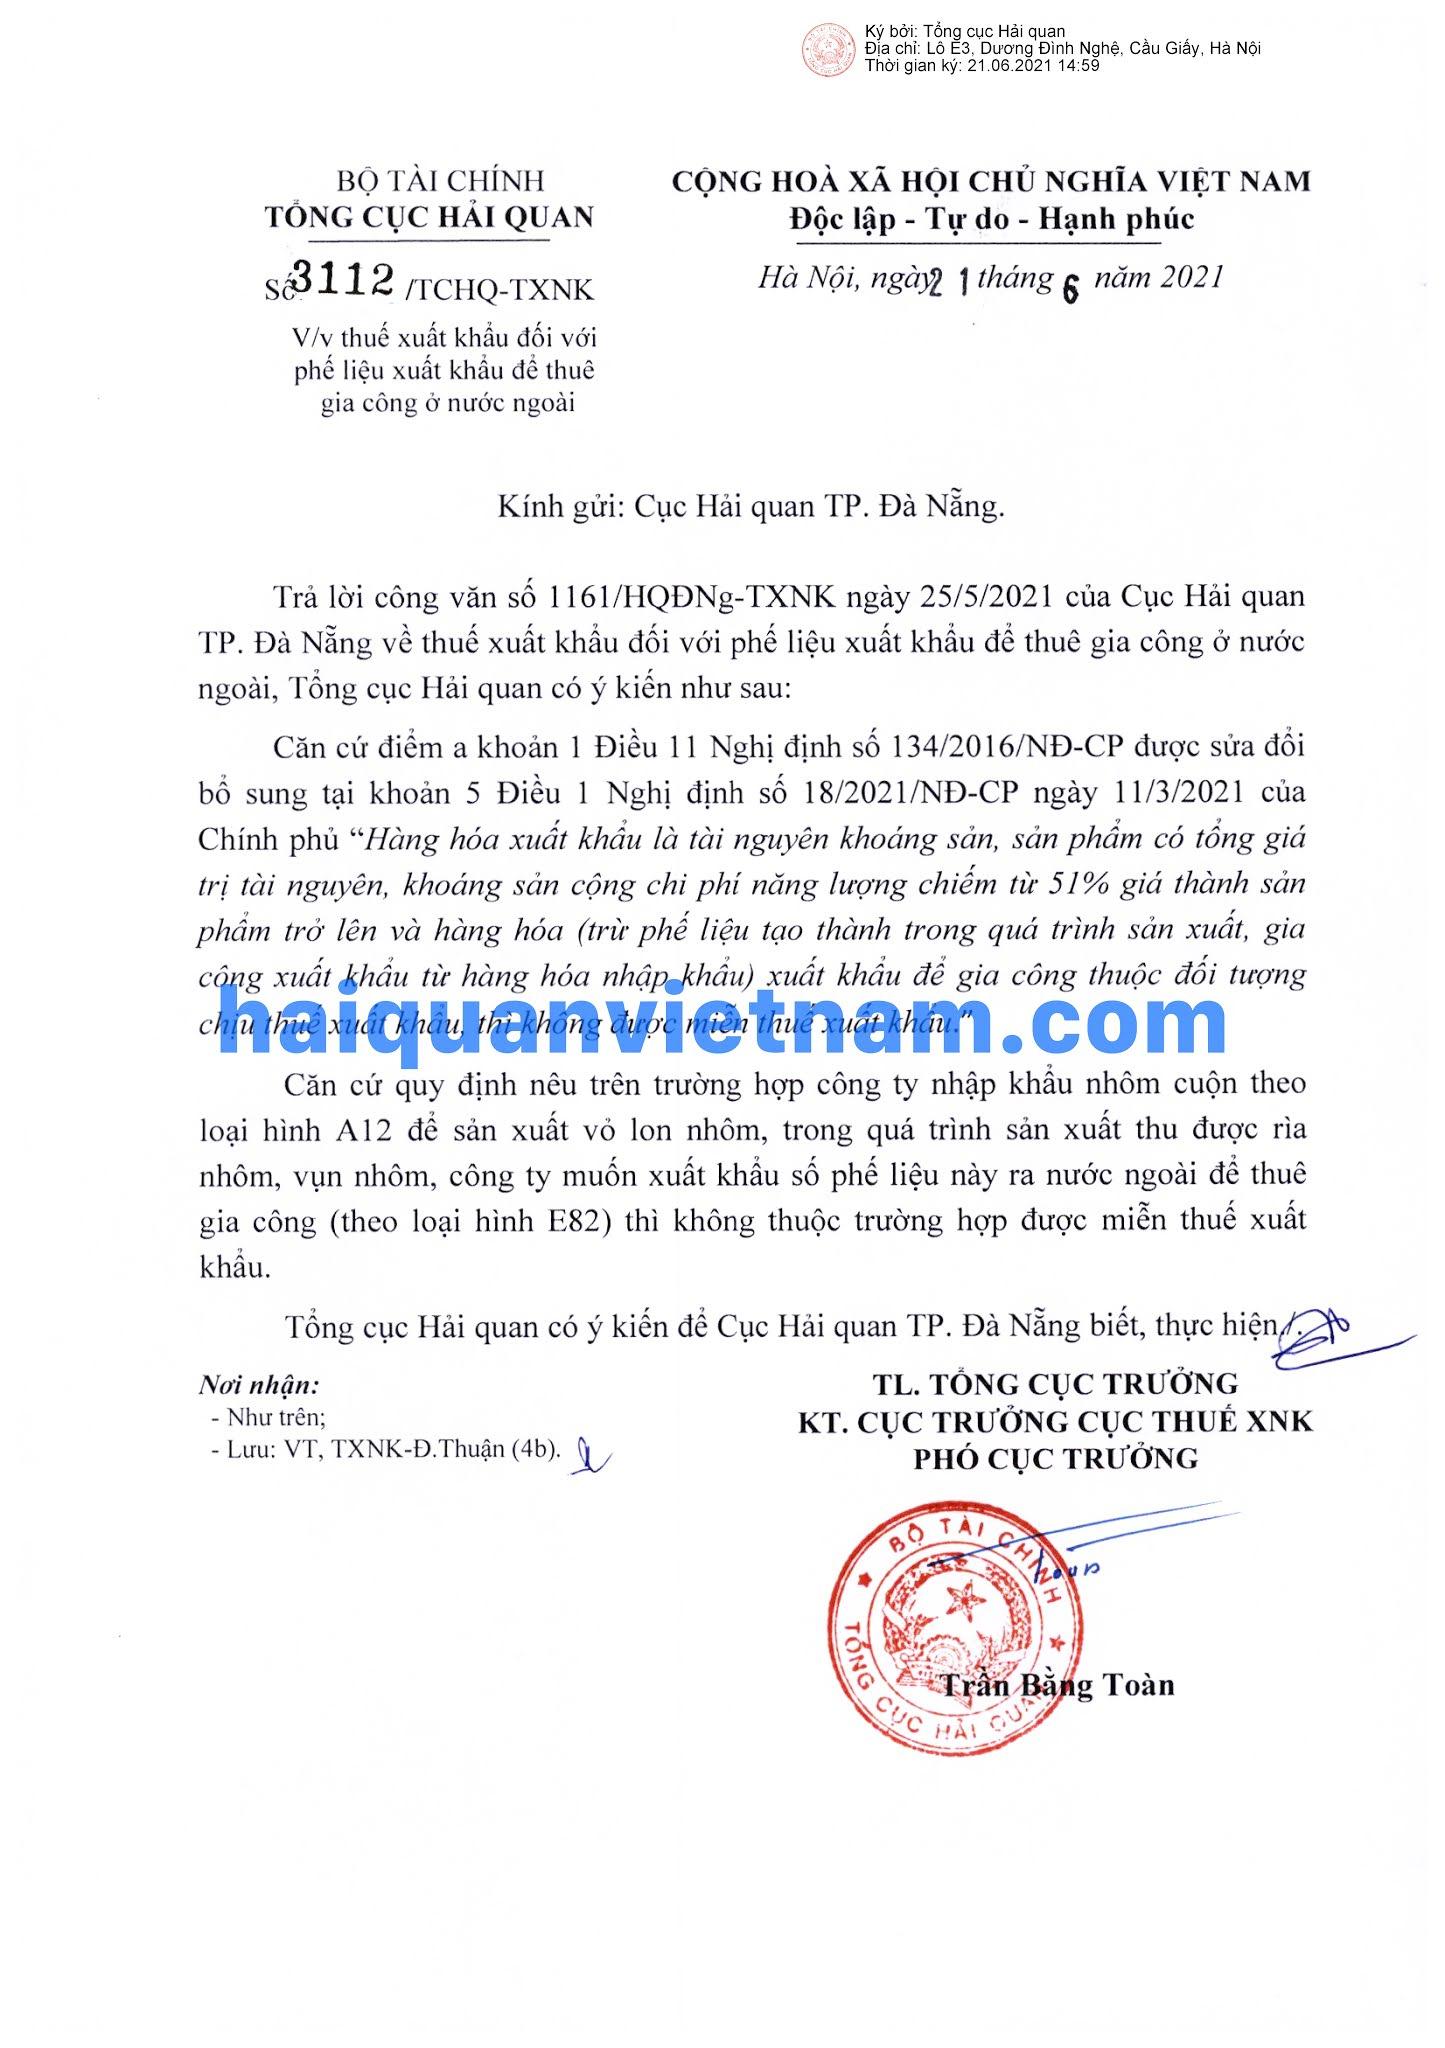 [Image: 200621_3112_TCHQ-TXNK_haiquanvietnam_01.jpg]